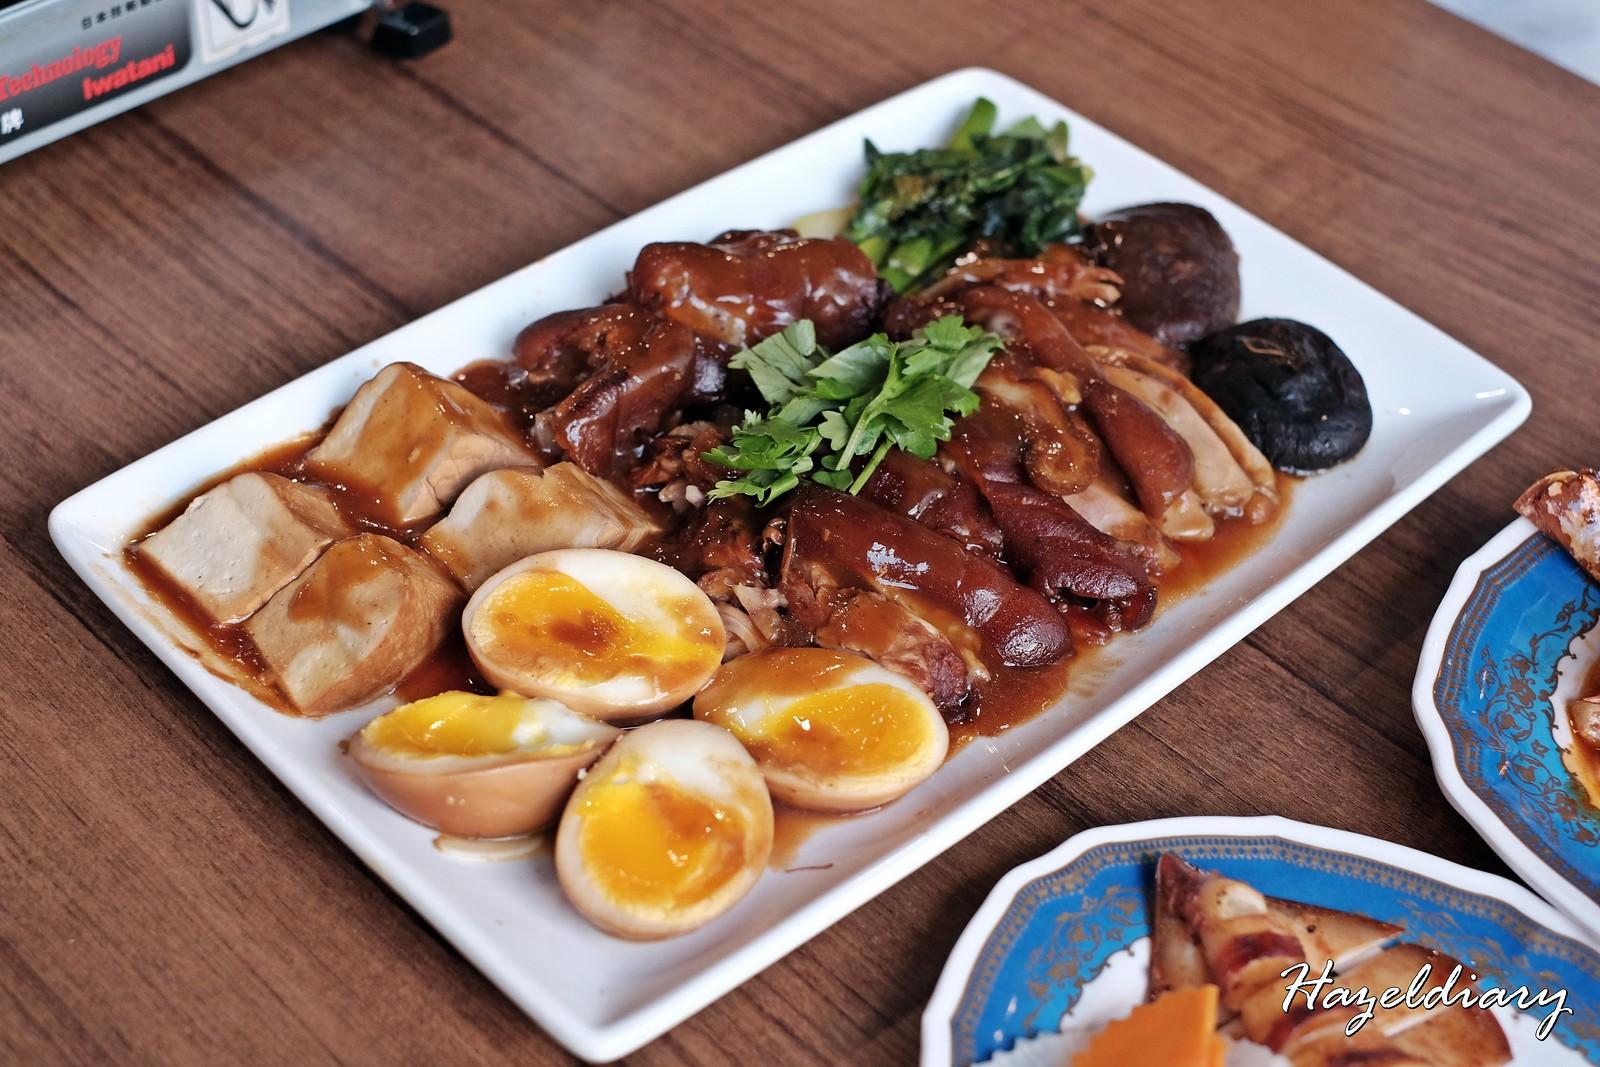 Soi Thai Soi Nice-Braised Pork Knuckle